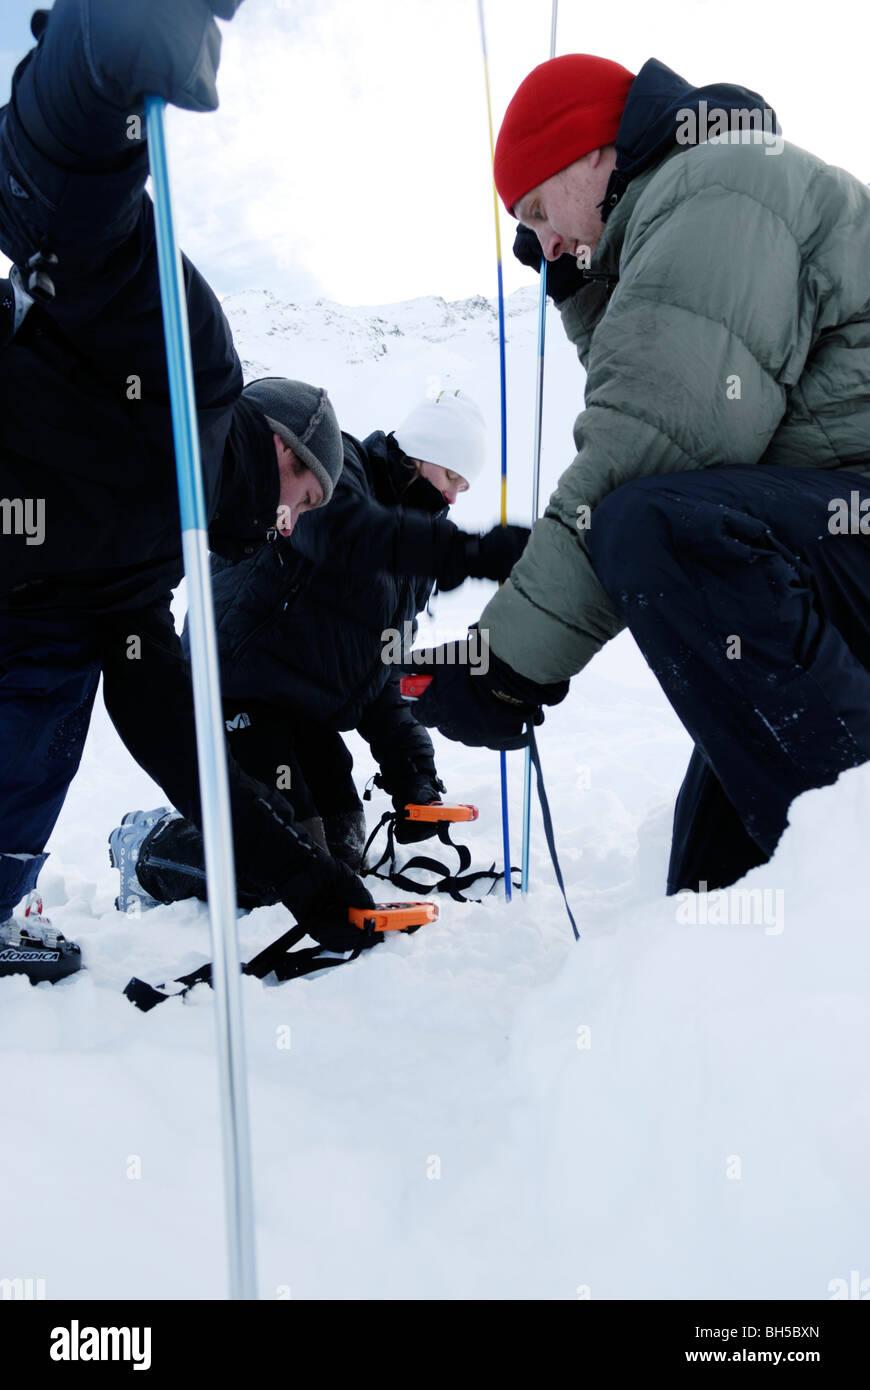 La survie sur la neige Avalanche Beacon